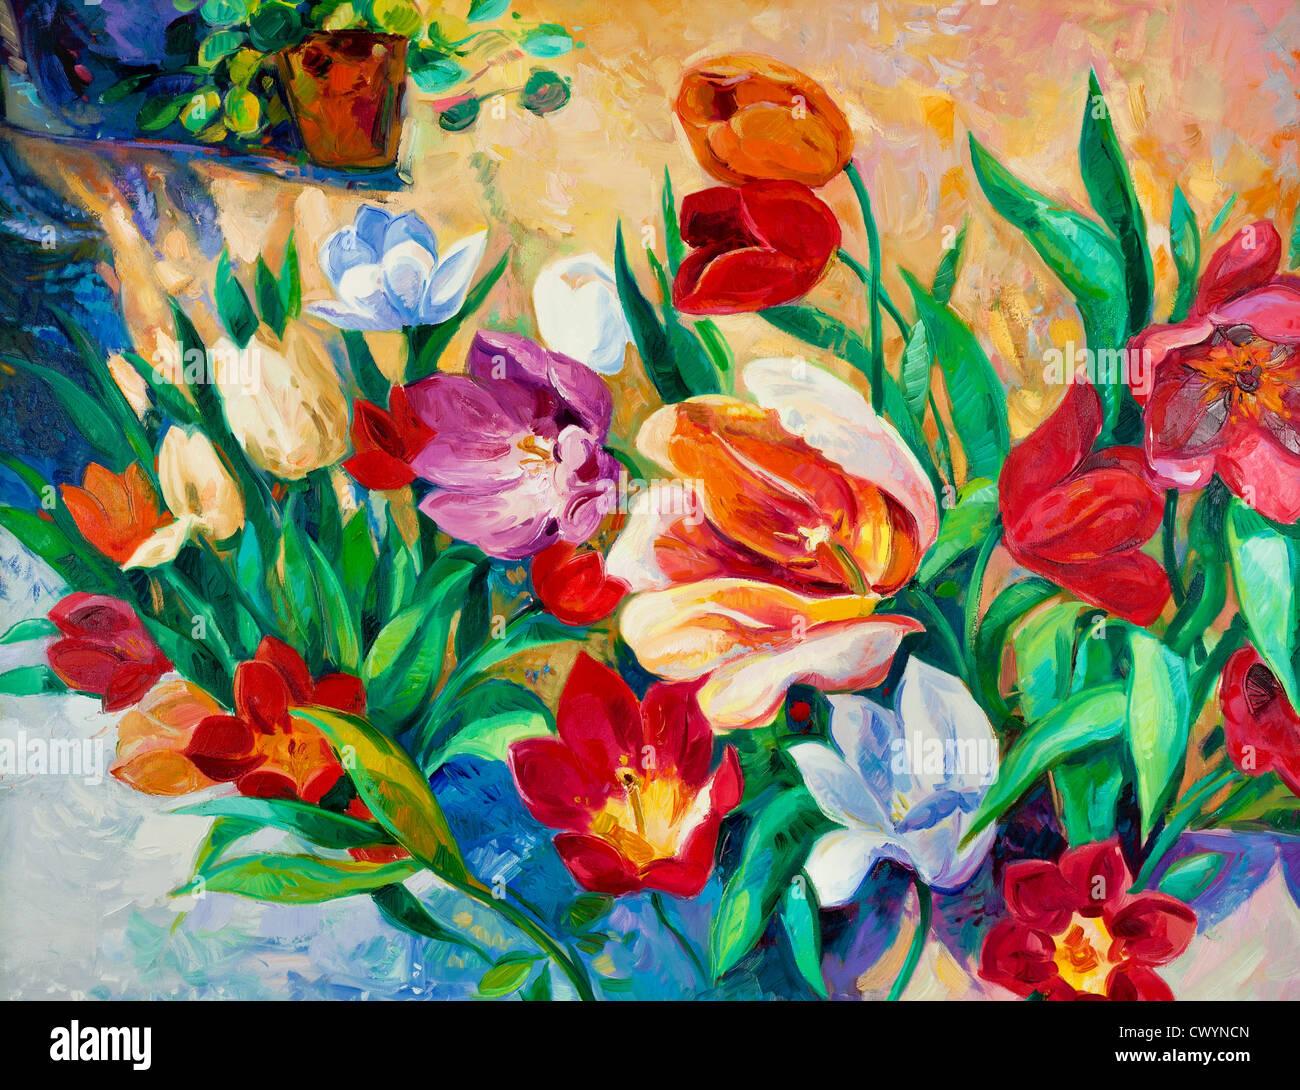 Original oil painting of beautiful vase or bowl of fresh flowers original oil painting of beautiful vase or bowl of fresh flowers on canvasdern impressionism floridaeventfo Images